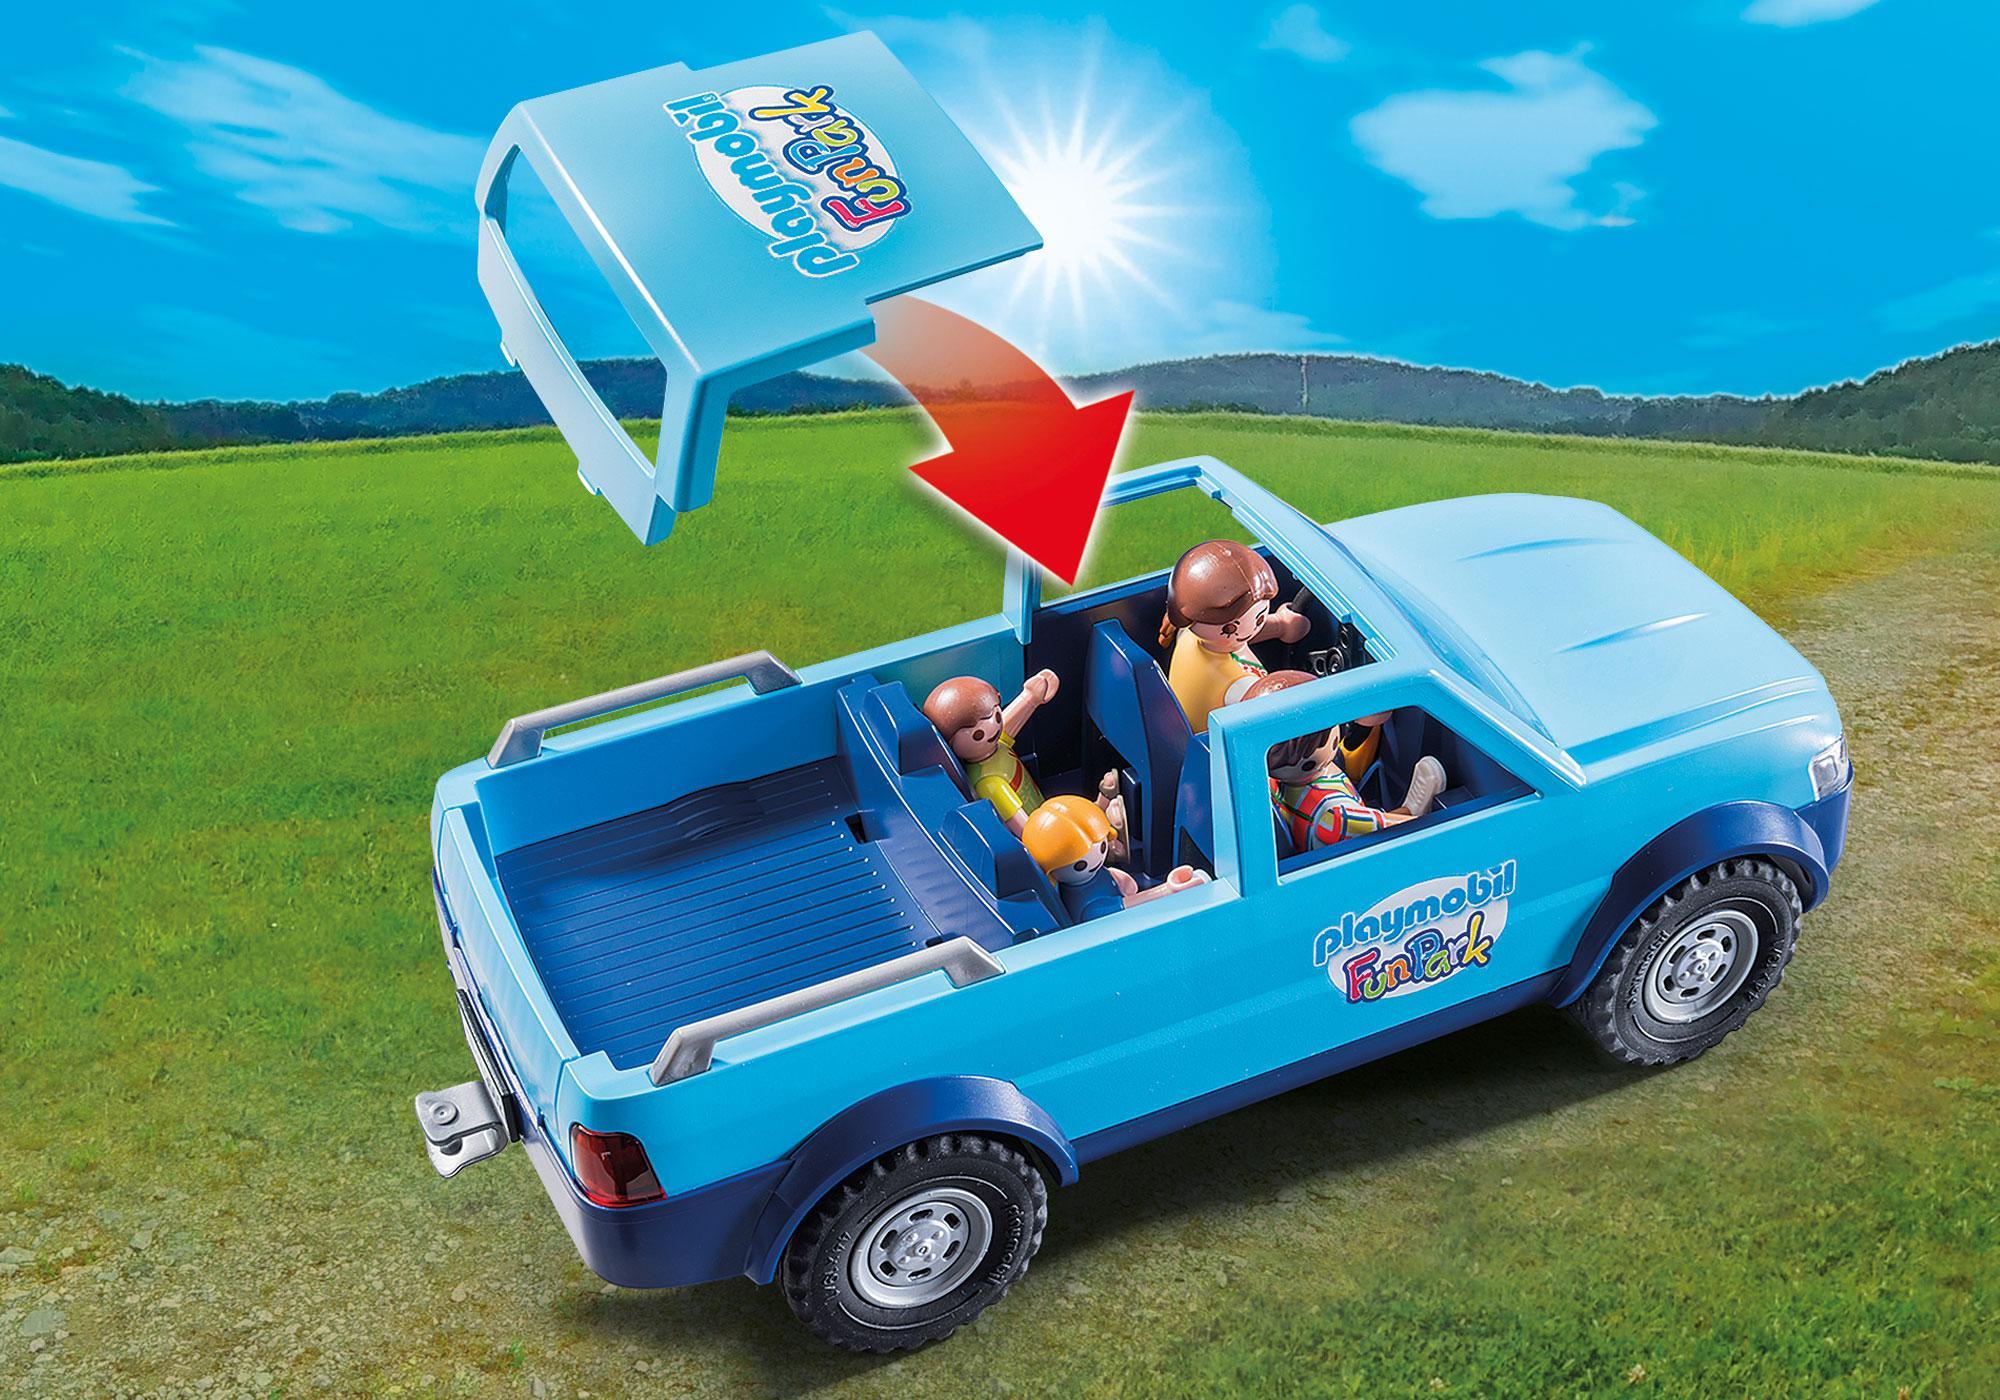 http://media.playmobil.com/i/playmobil/9502_product_extra1/Famille avec voiture et caravane